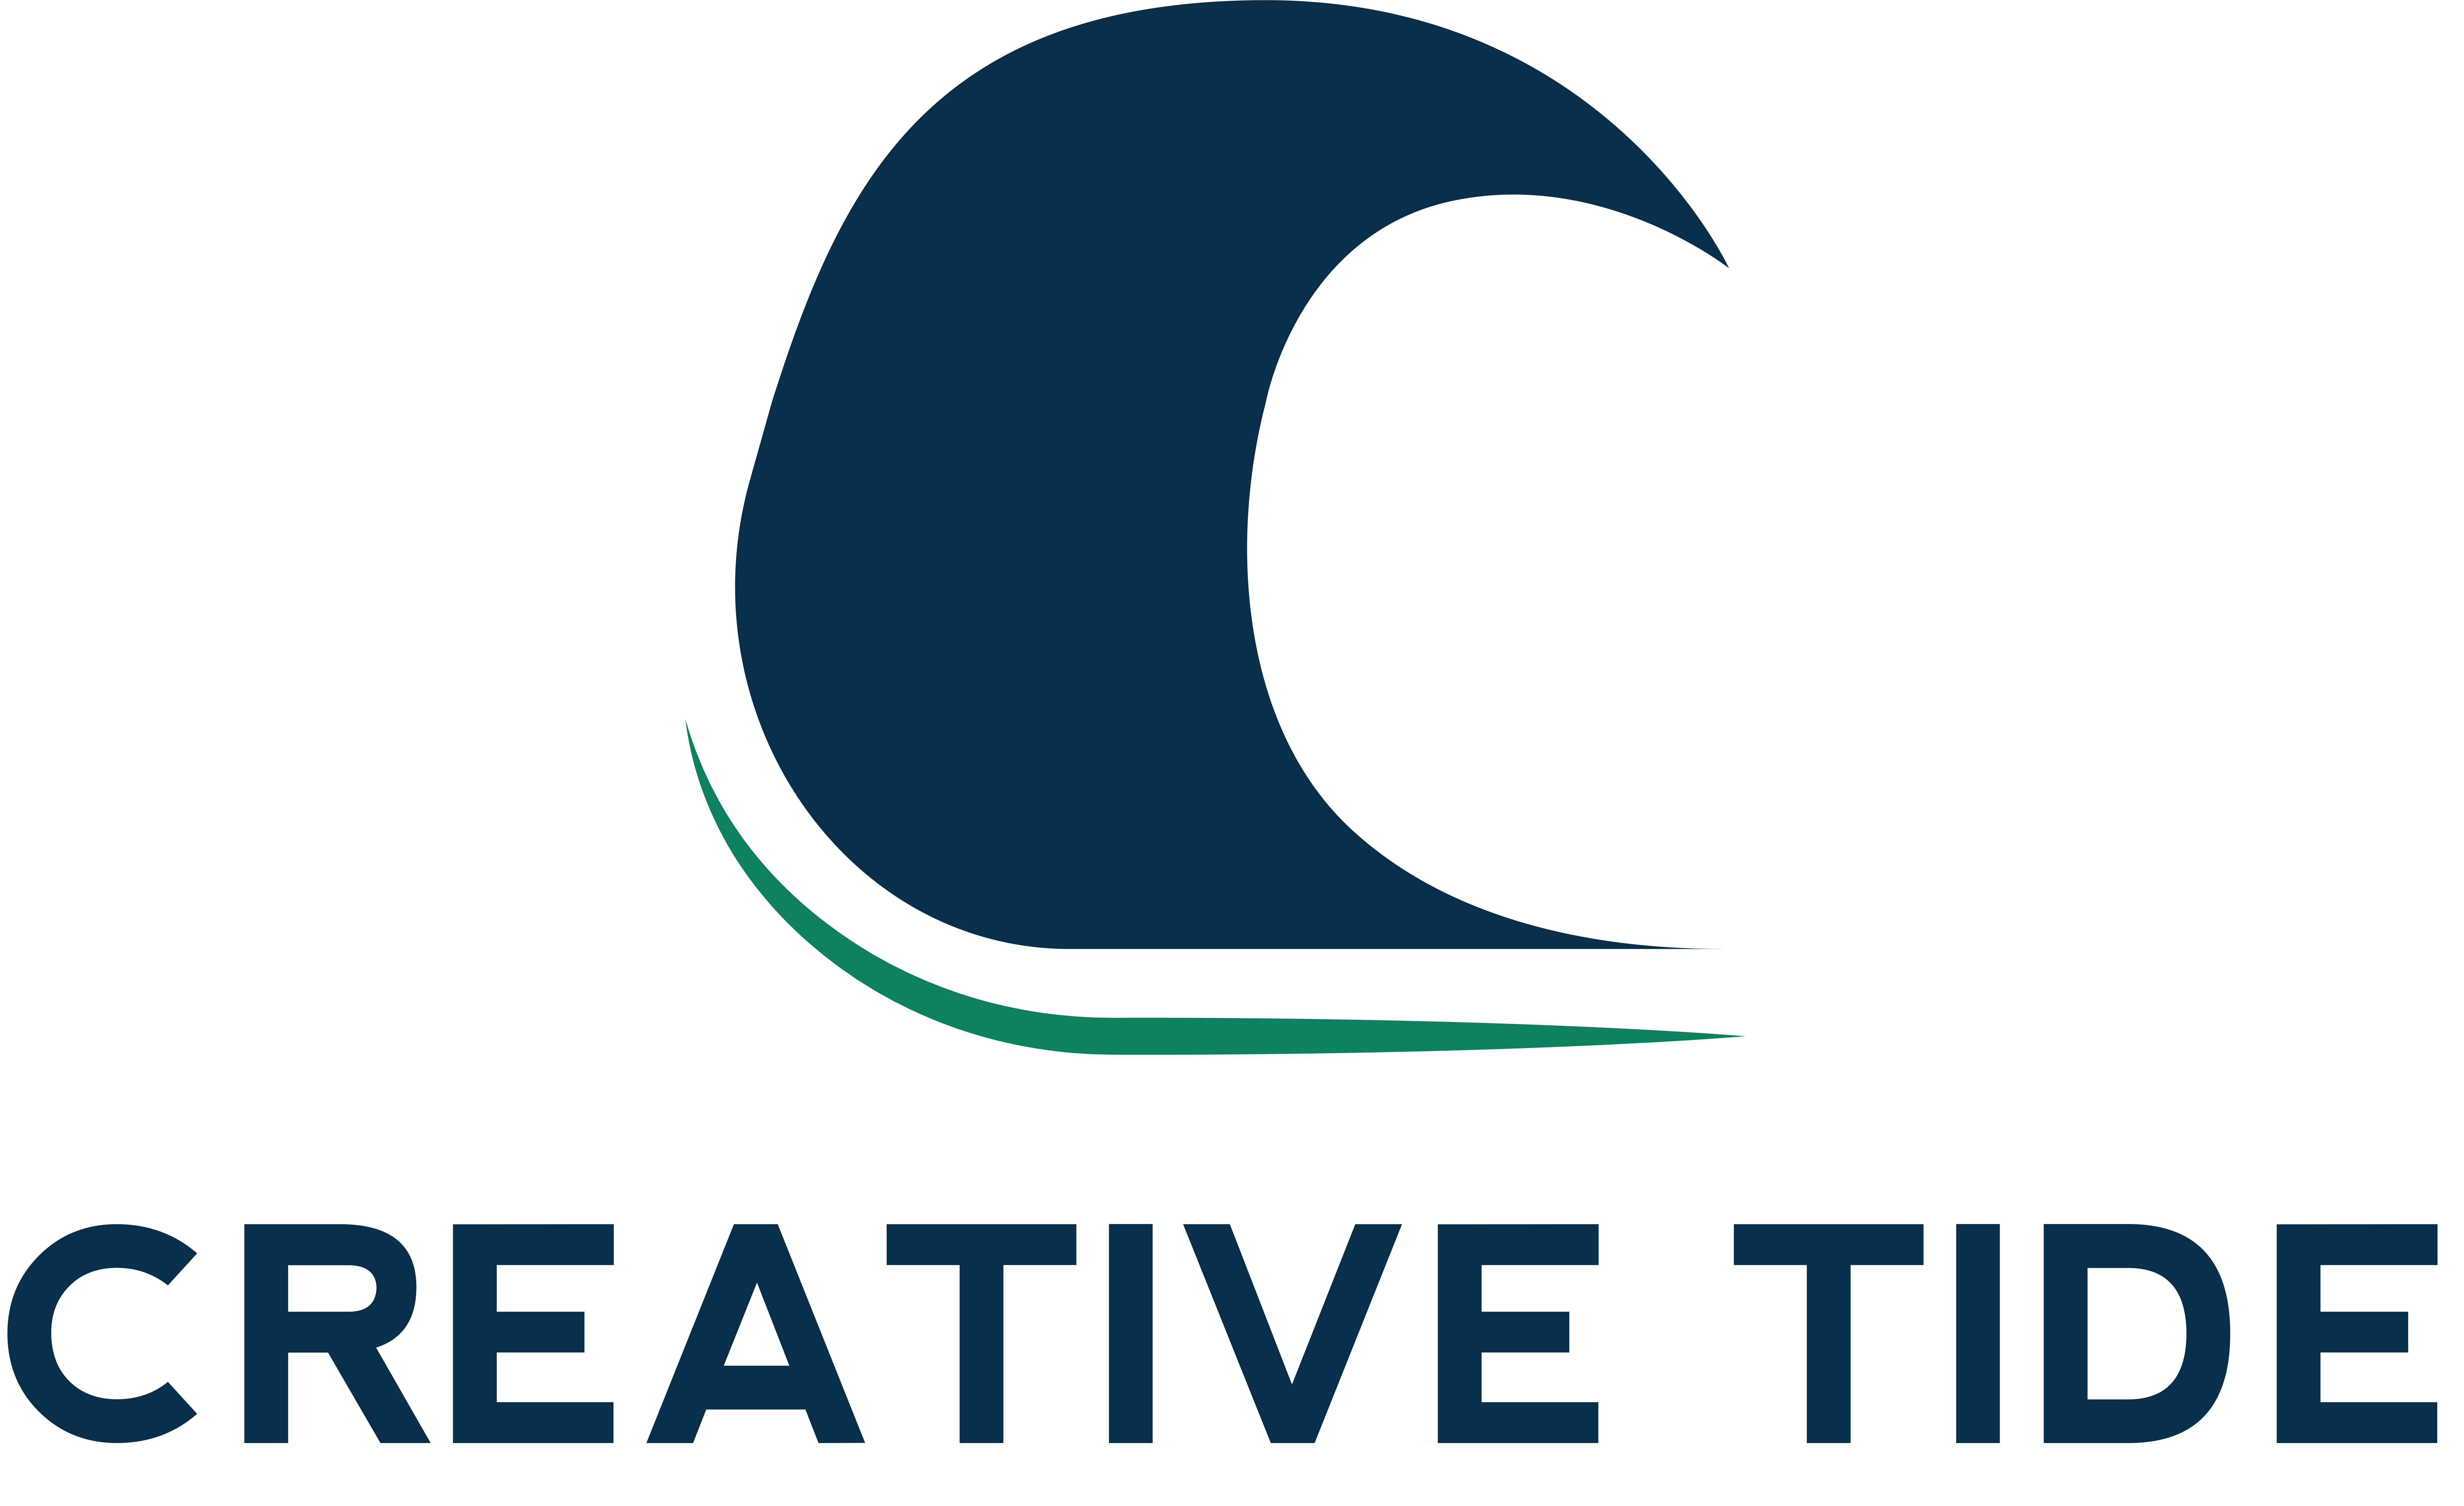 Creative Tide logo